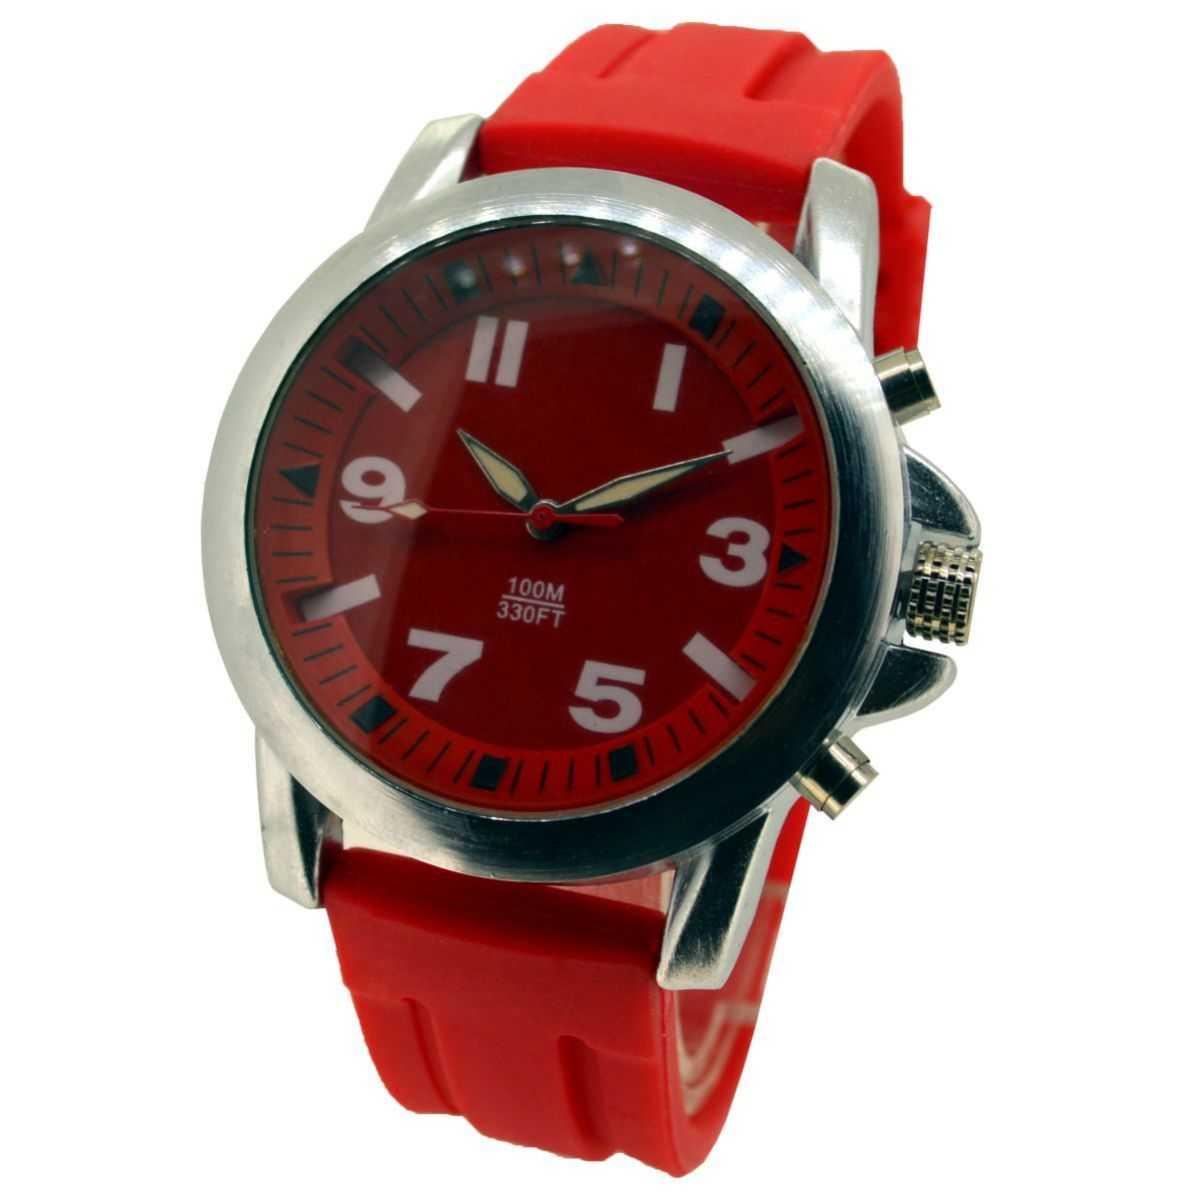 Relógio Personalizado 2463-4